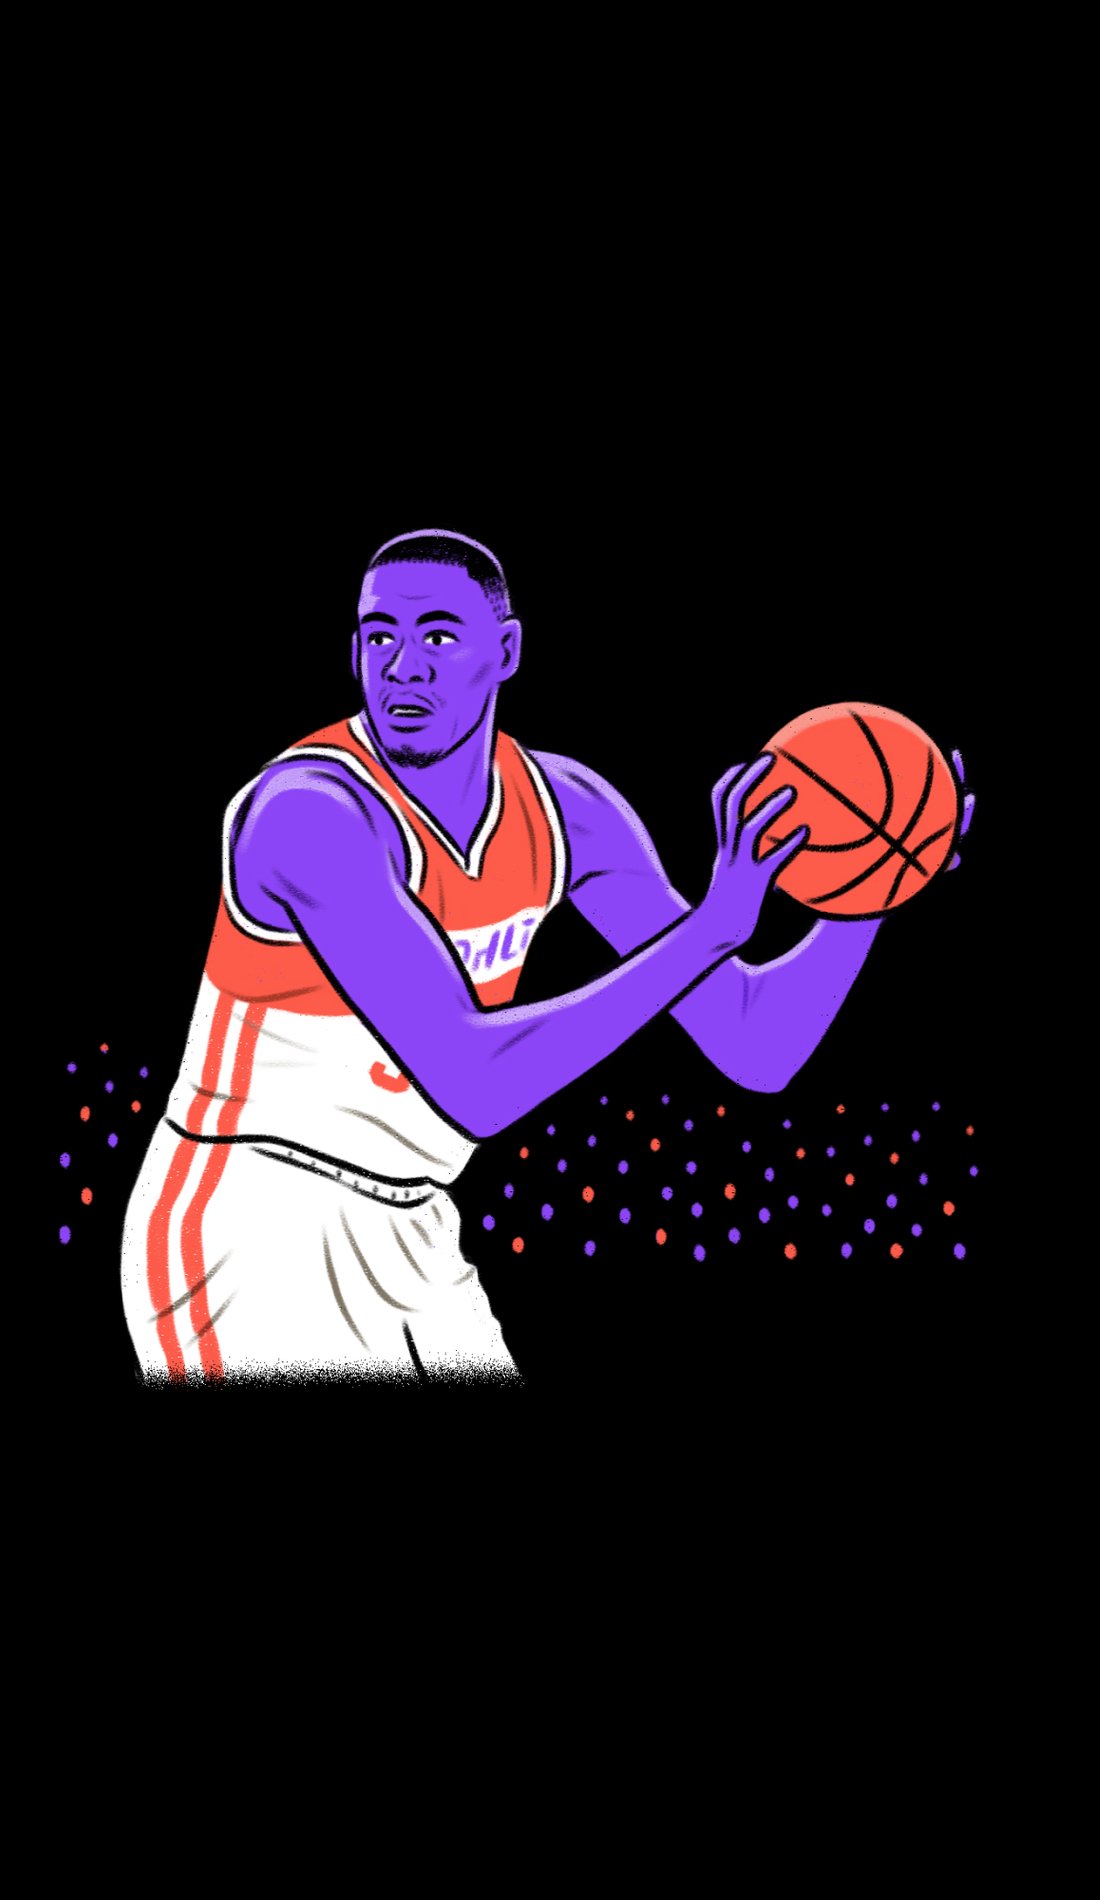 A Northern Arizona Lumberjacks Basketball live event